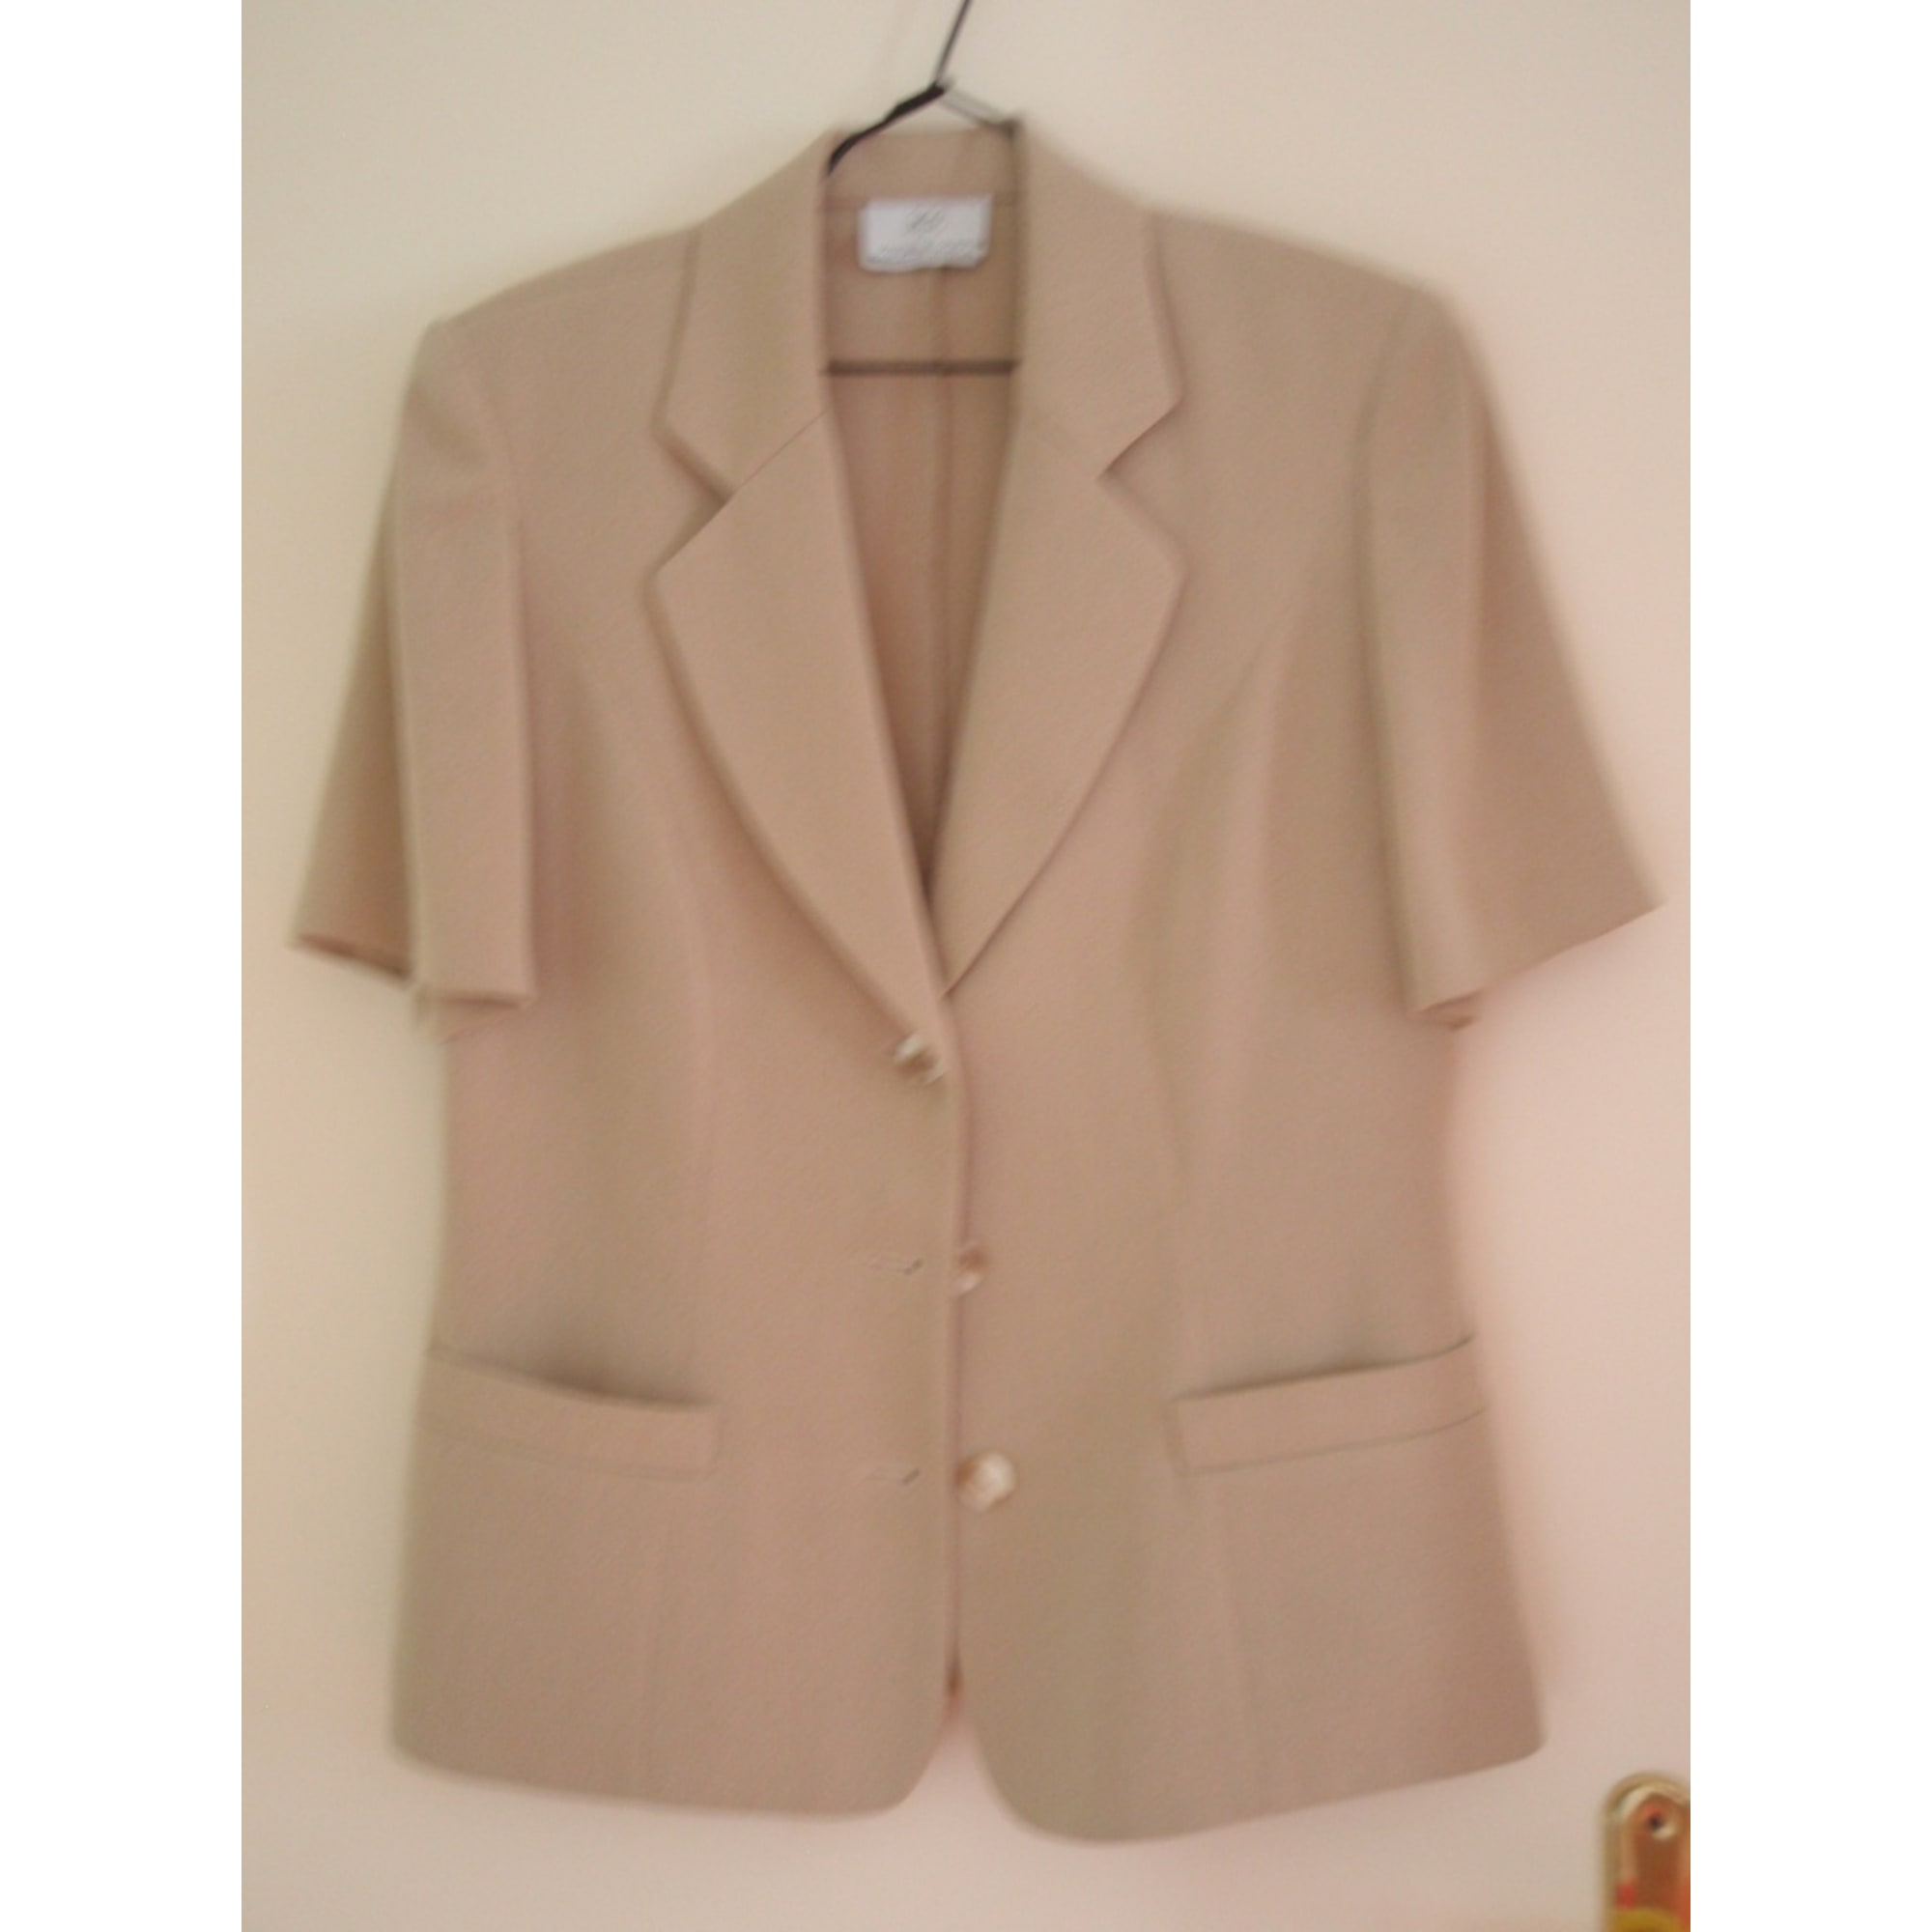 Blazer, veste tailleur MARCELLE GRIFFON Beige, camel